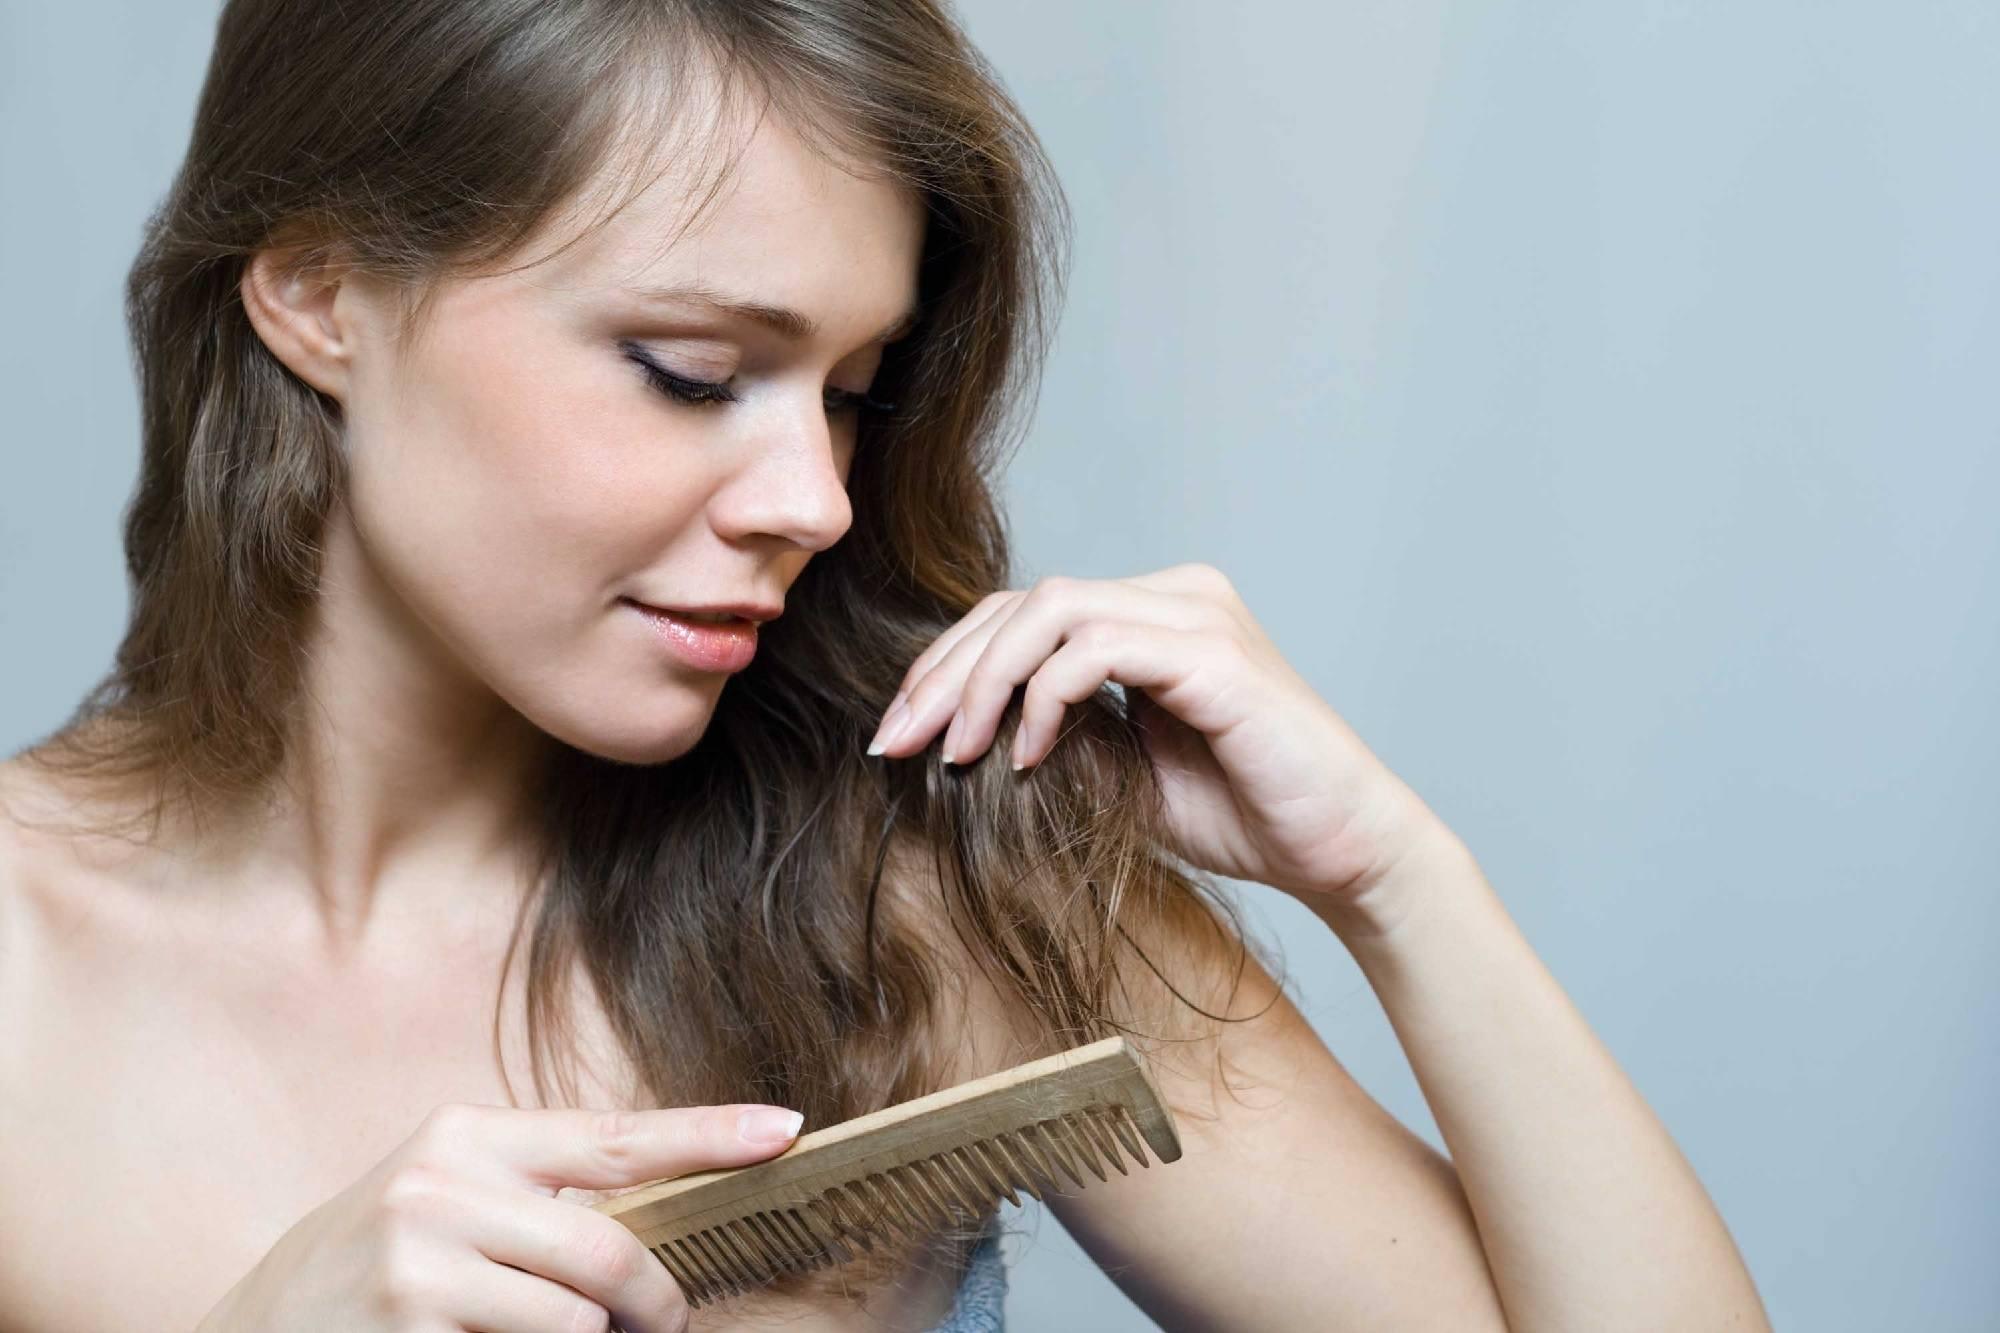 Rainy day hair care tips - Detangle